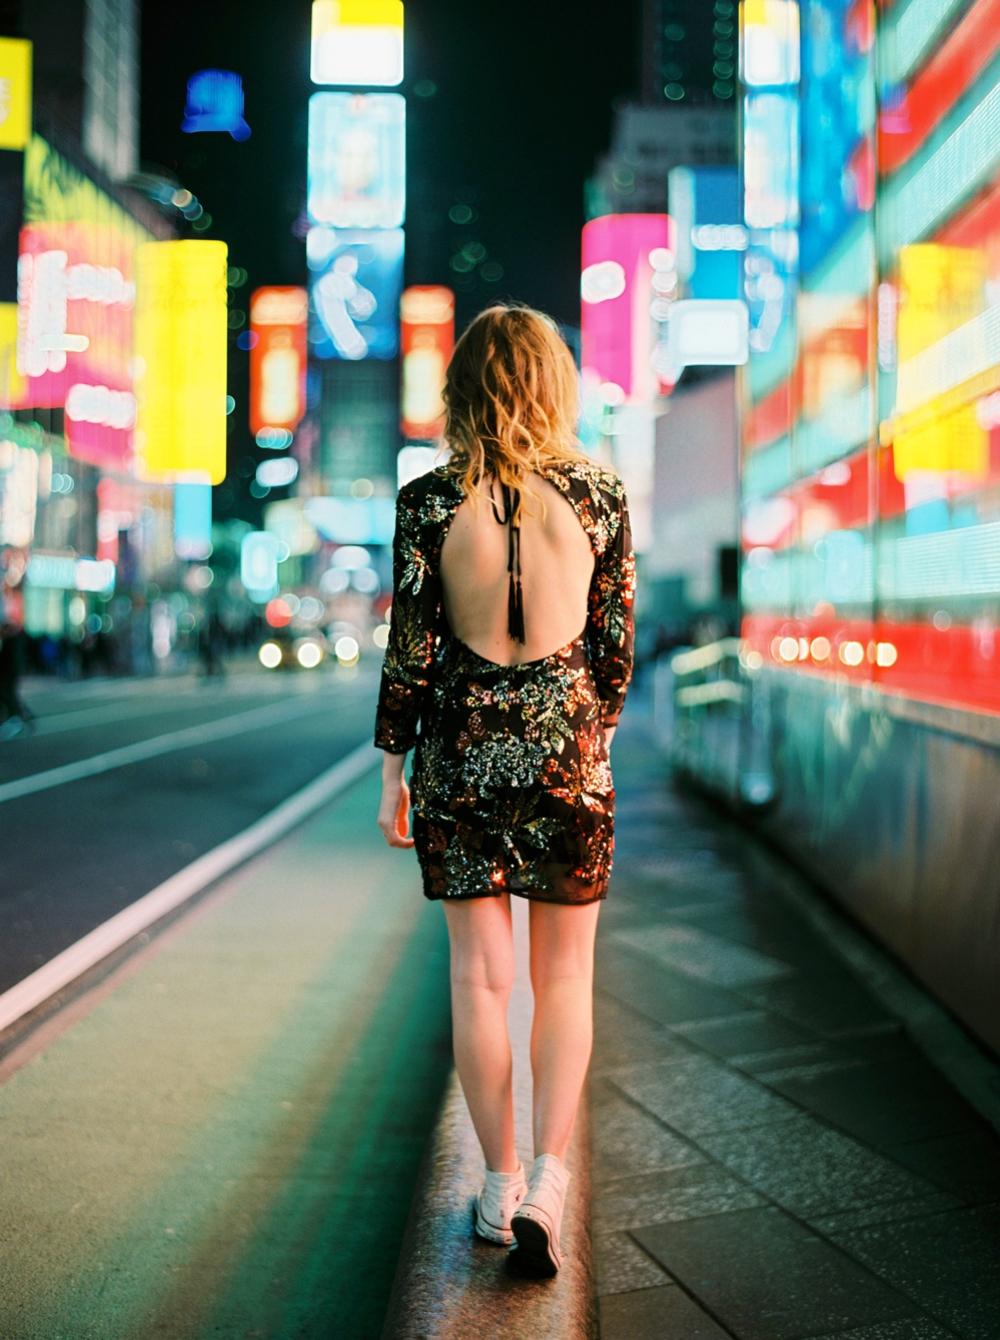 Calgary Wedding Photographers | New York City Photographer NYC | Times Square | Fashion Photography